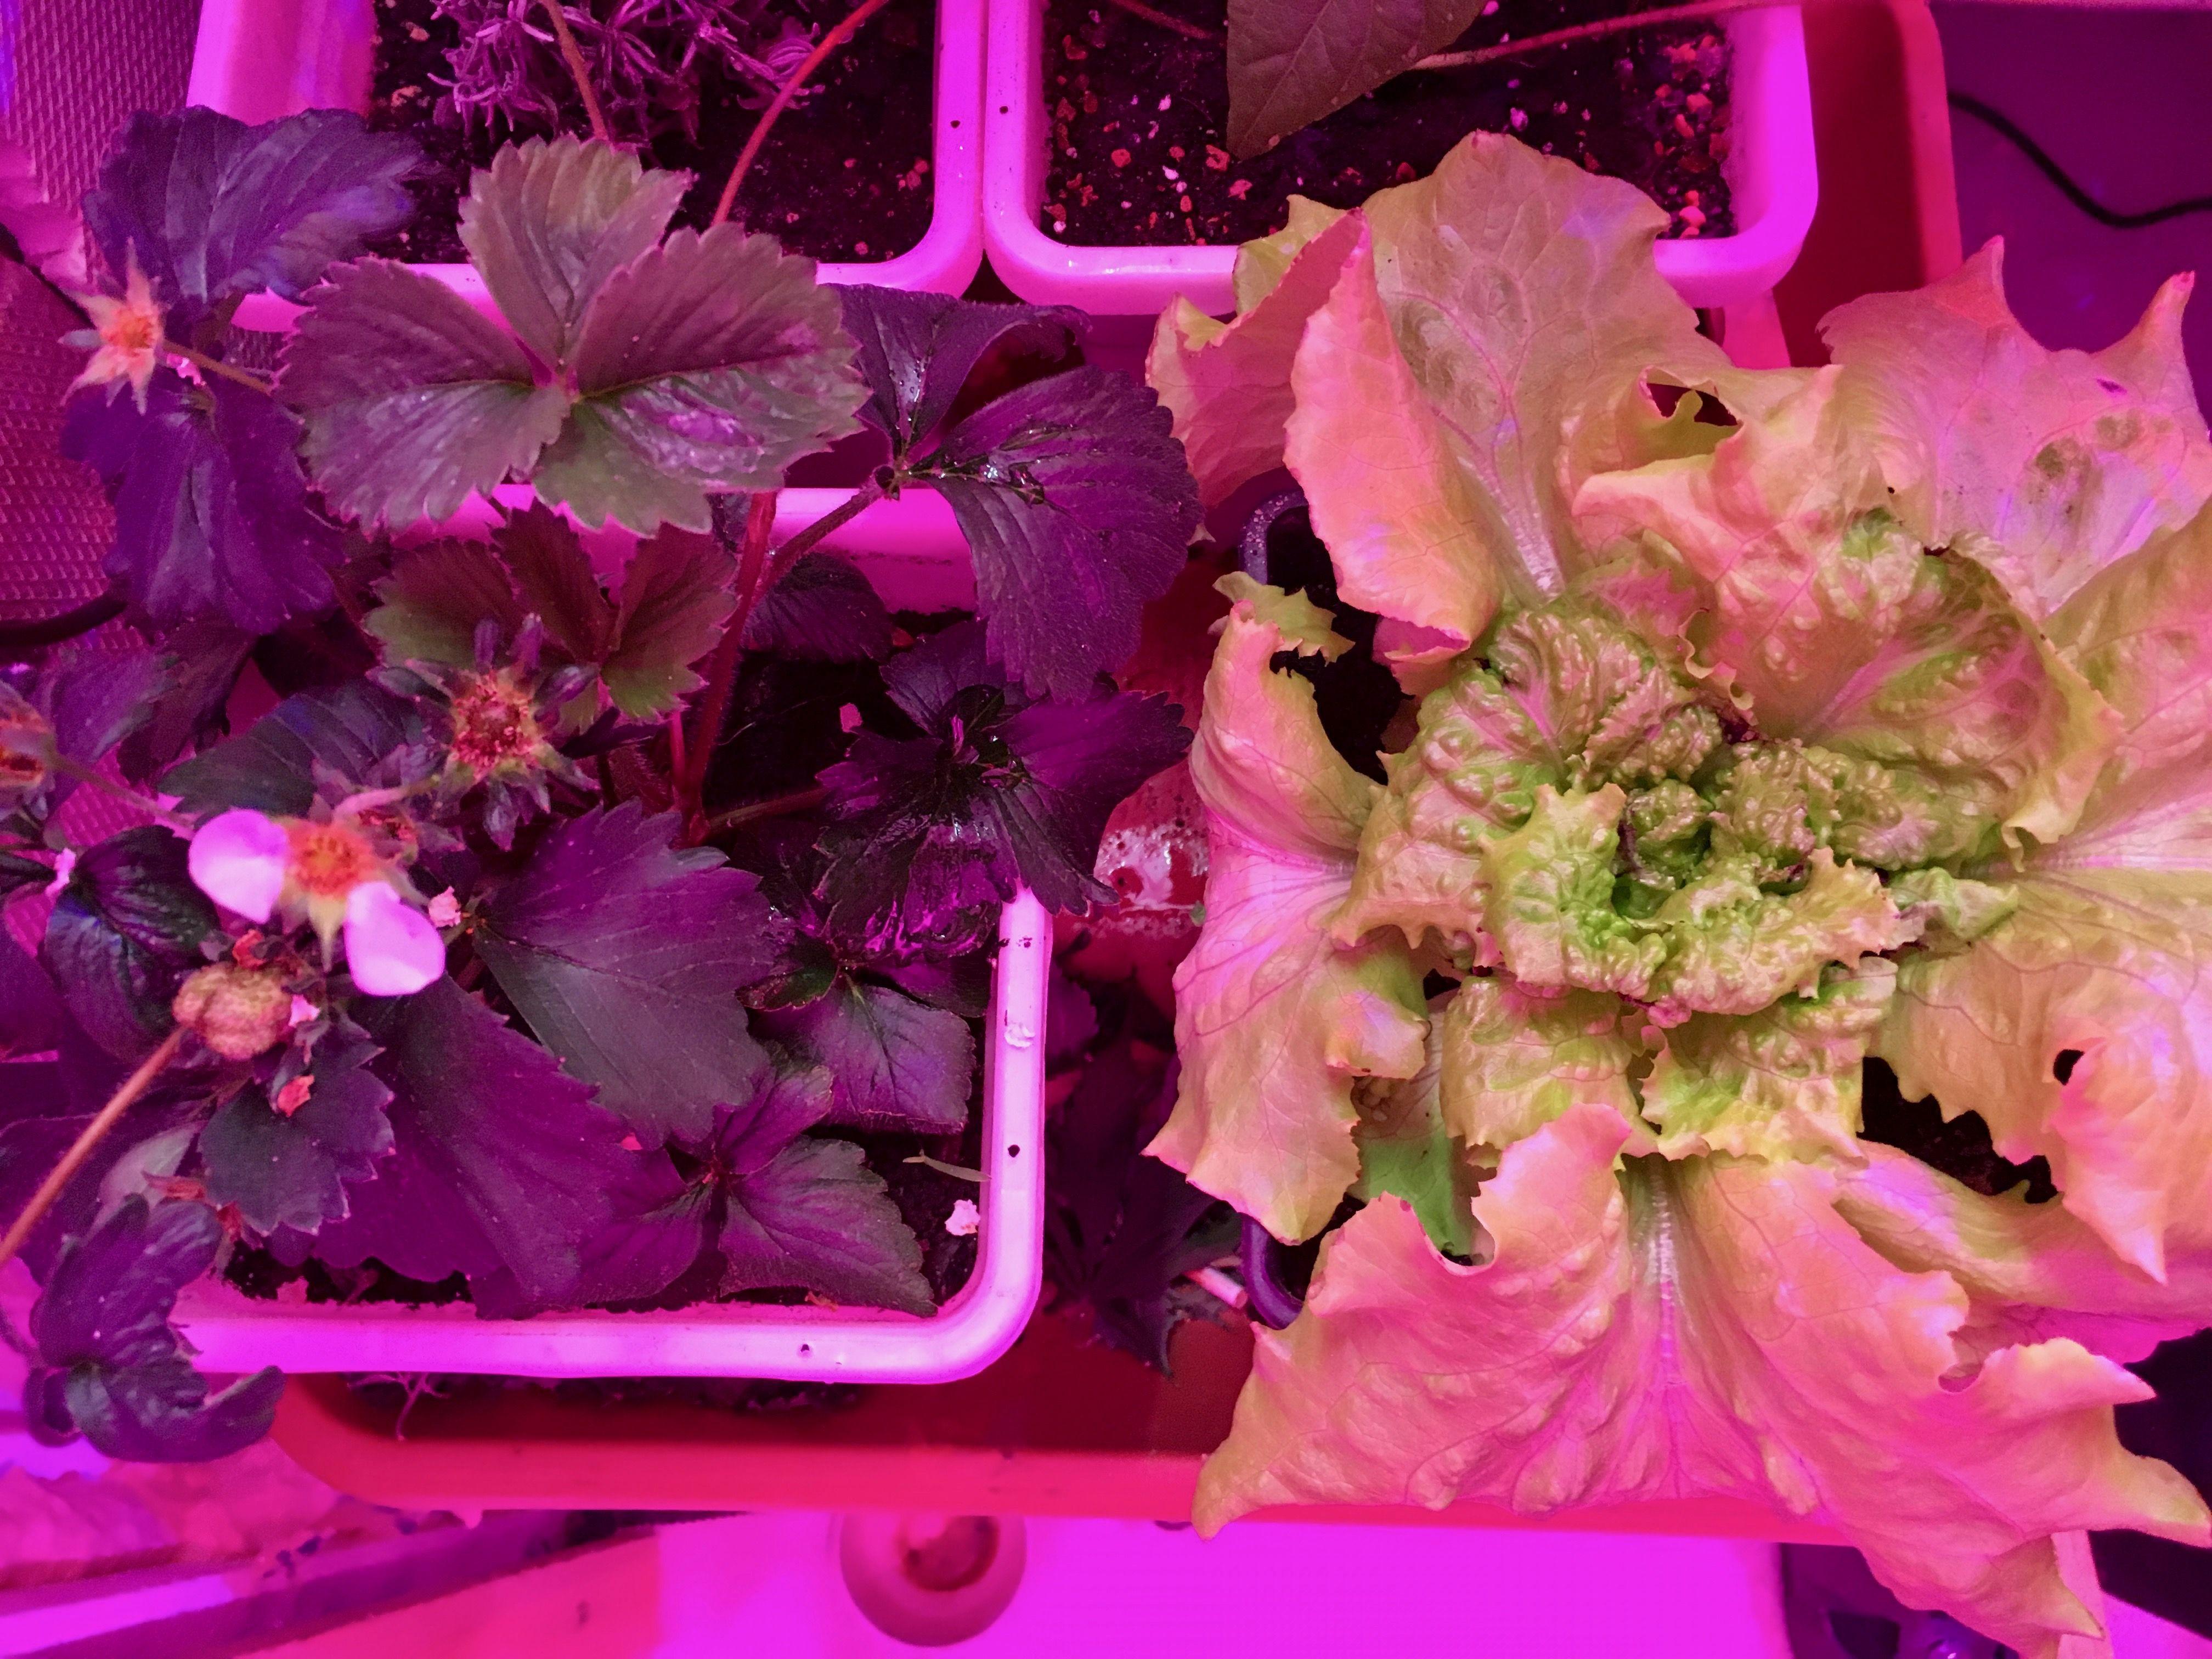 Strawberrys Fruits Erdbeeren Salad Salat Led Pflanzen Lampe Licht Beleuchtung Gartenbau Gemusebau Gartner Pflanzenlampe Pflanzen Led Pflanzenlampe